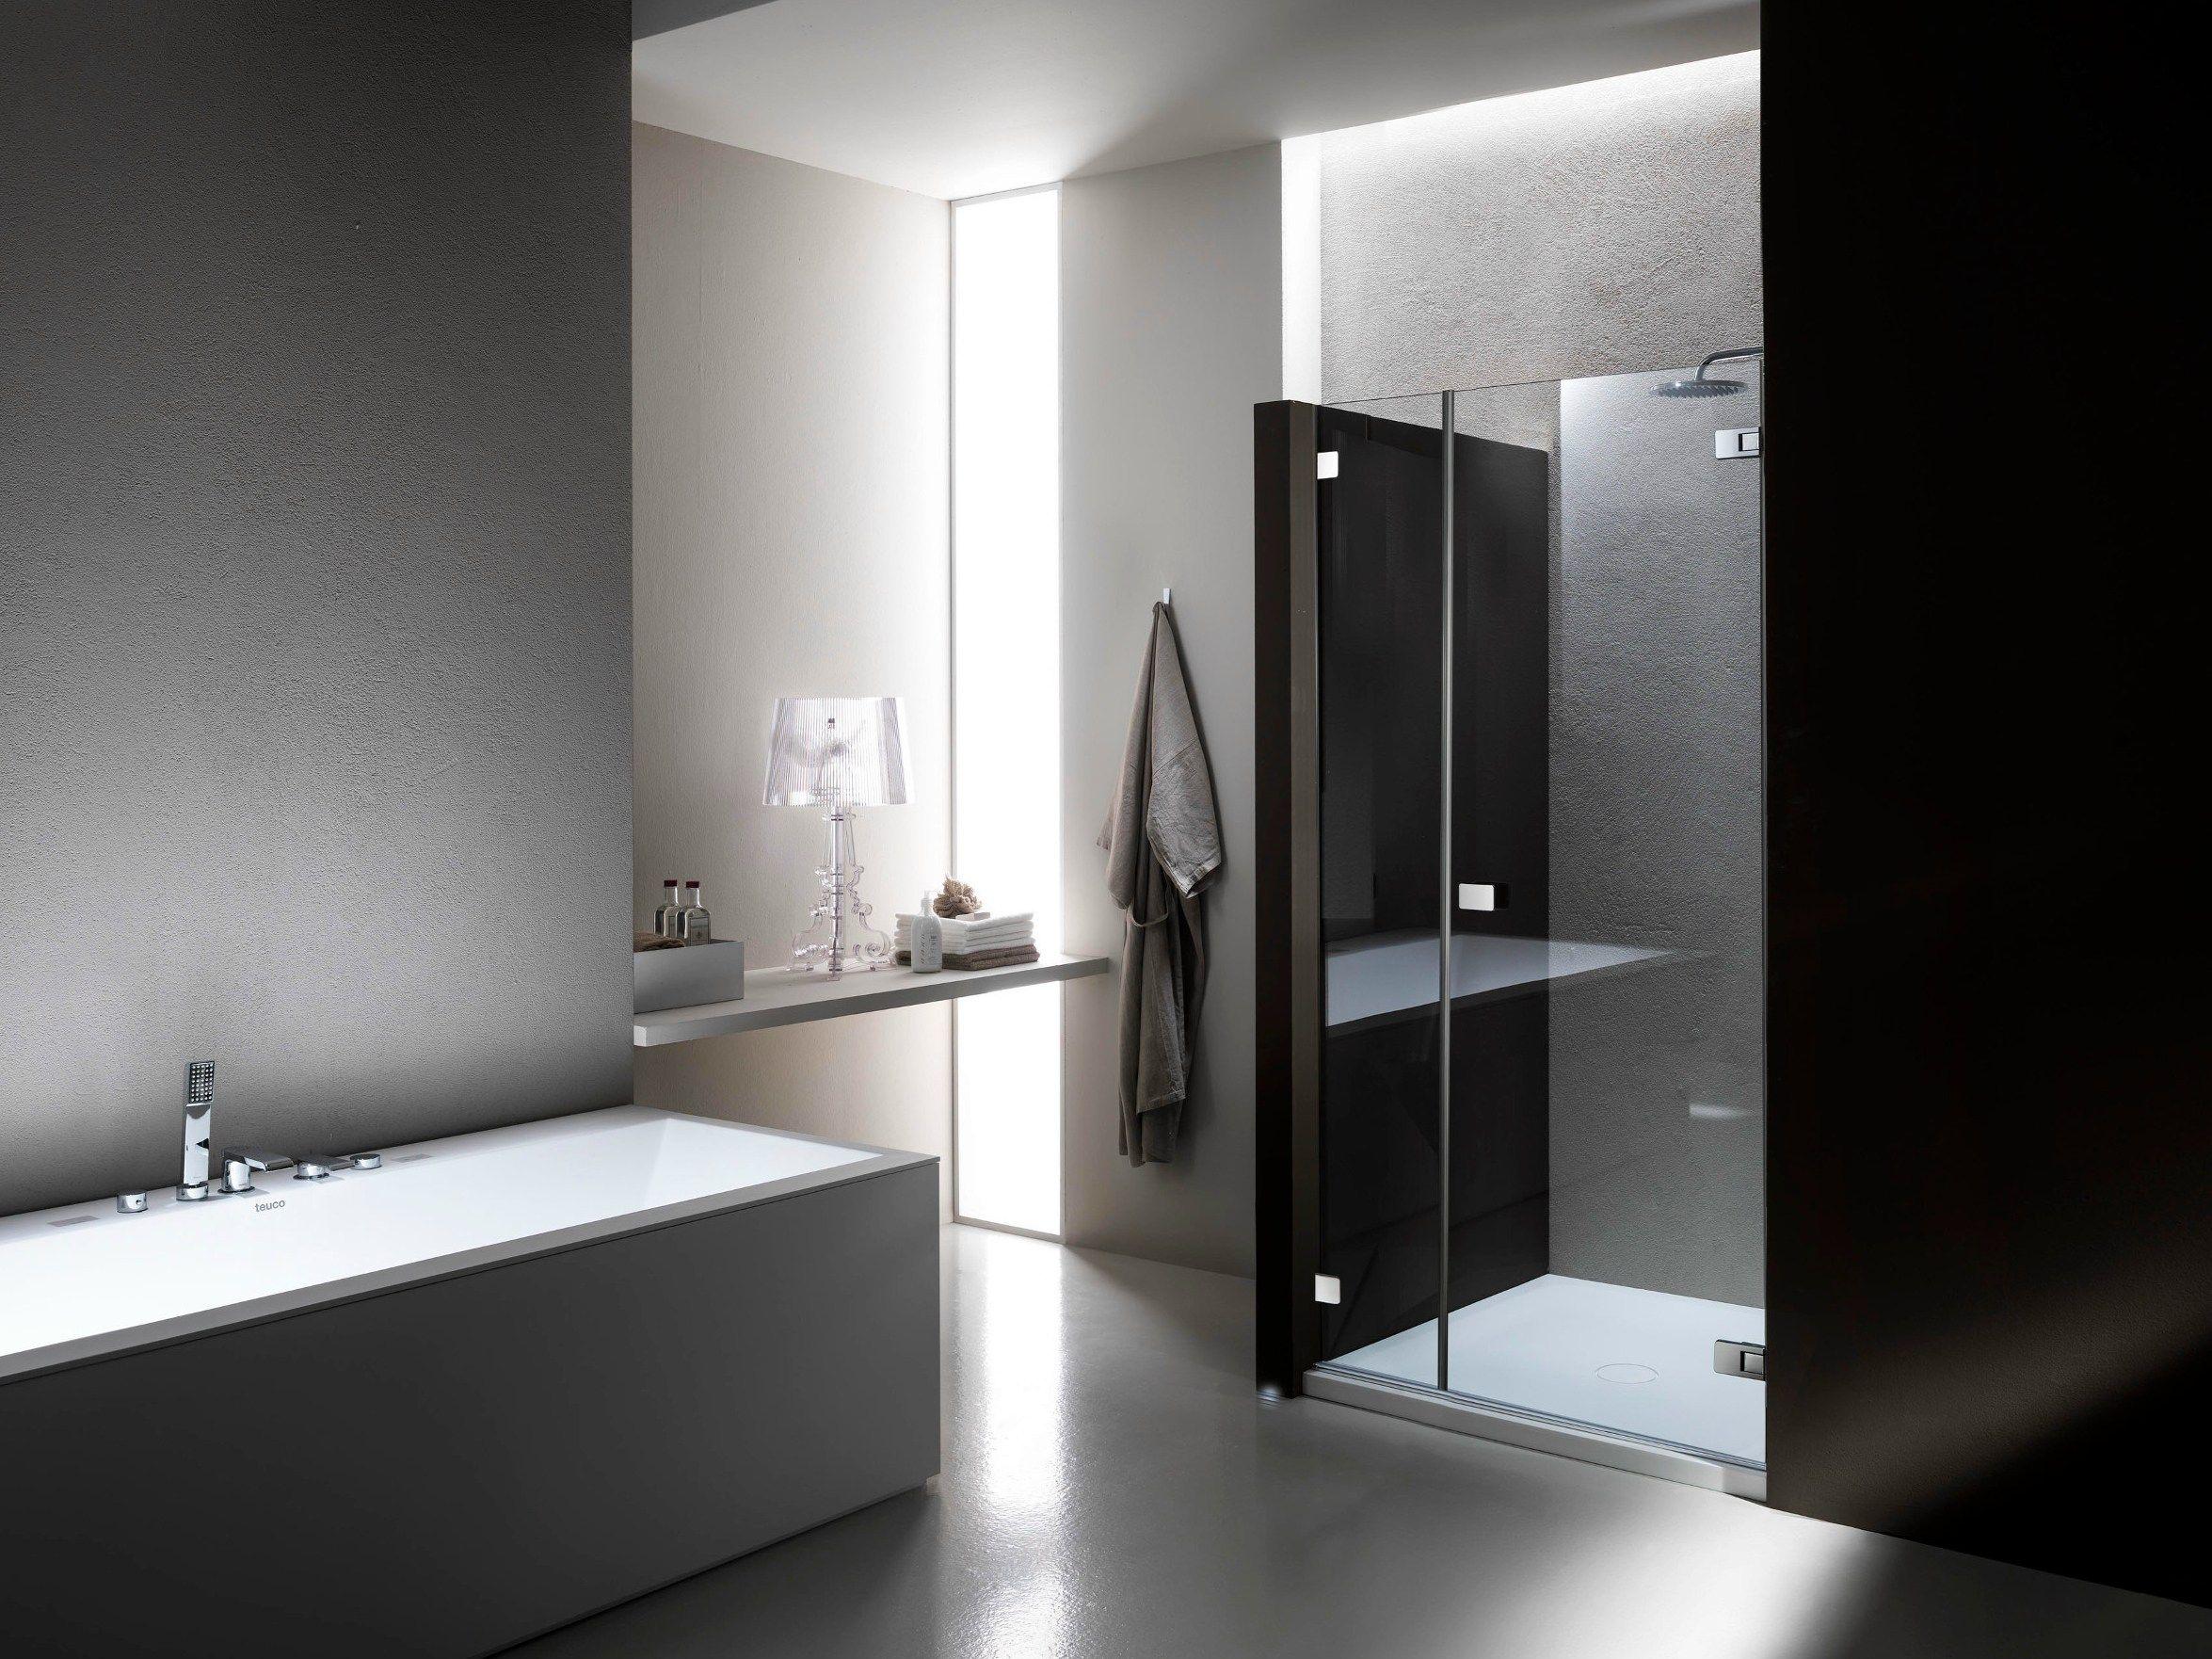 Vetro x doccia boiserie in ceramica per bagno - Doccia senza porta ...